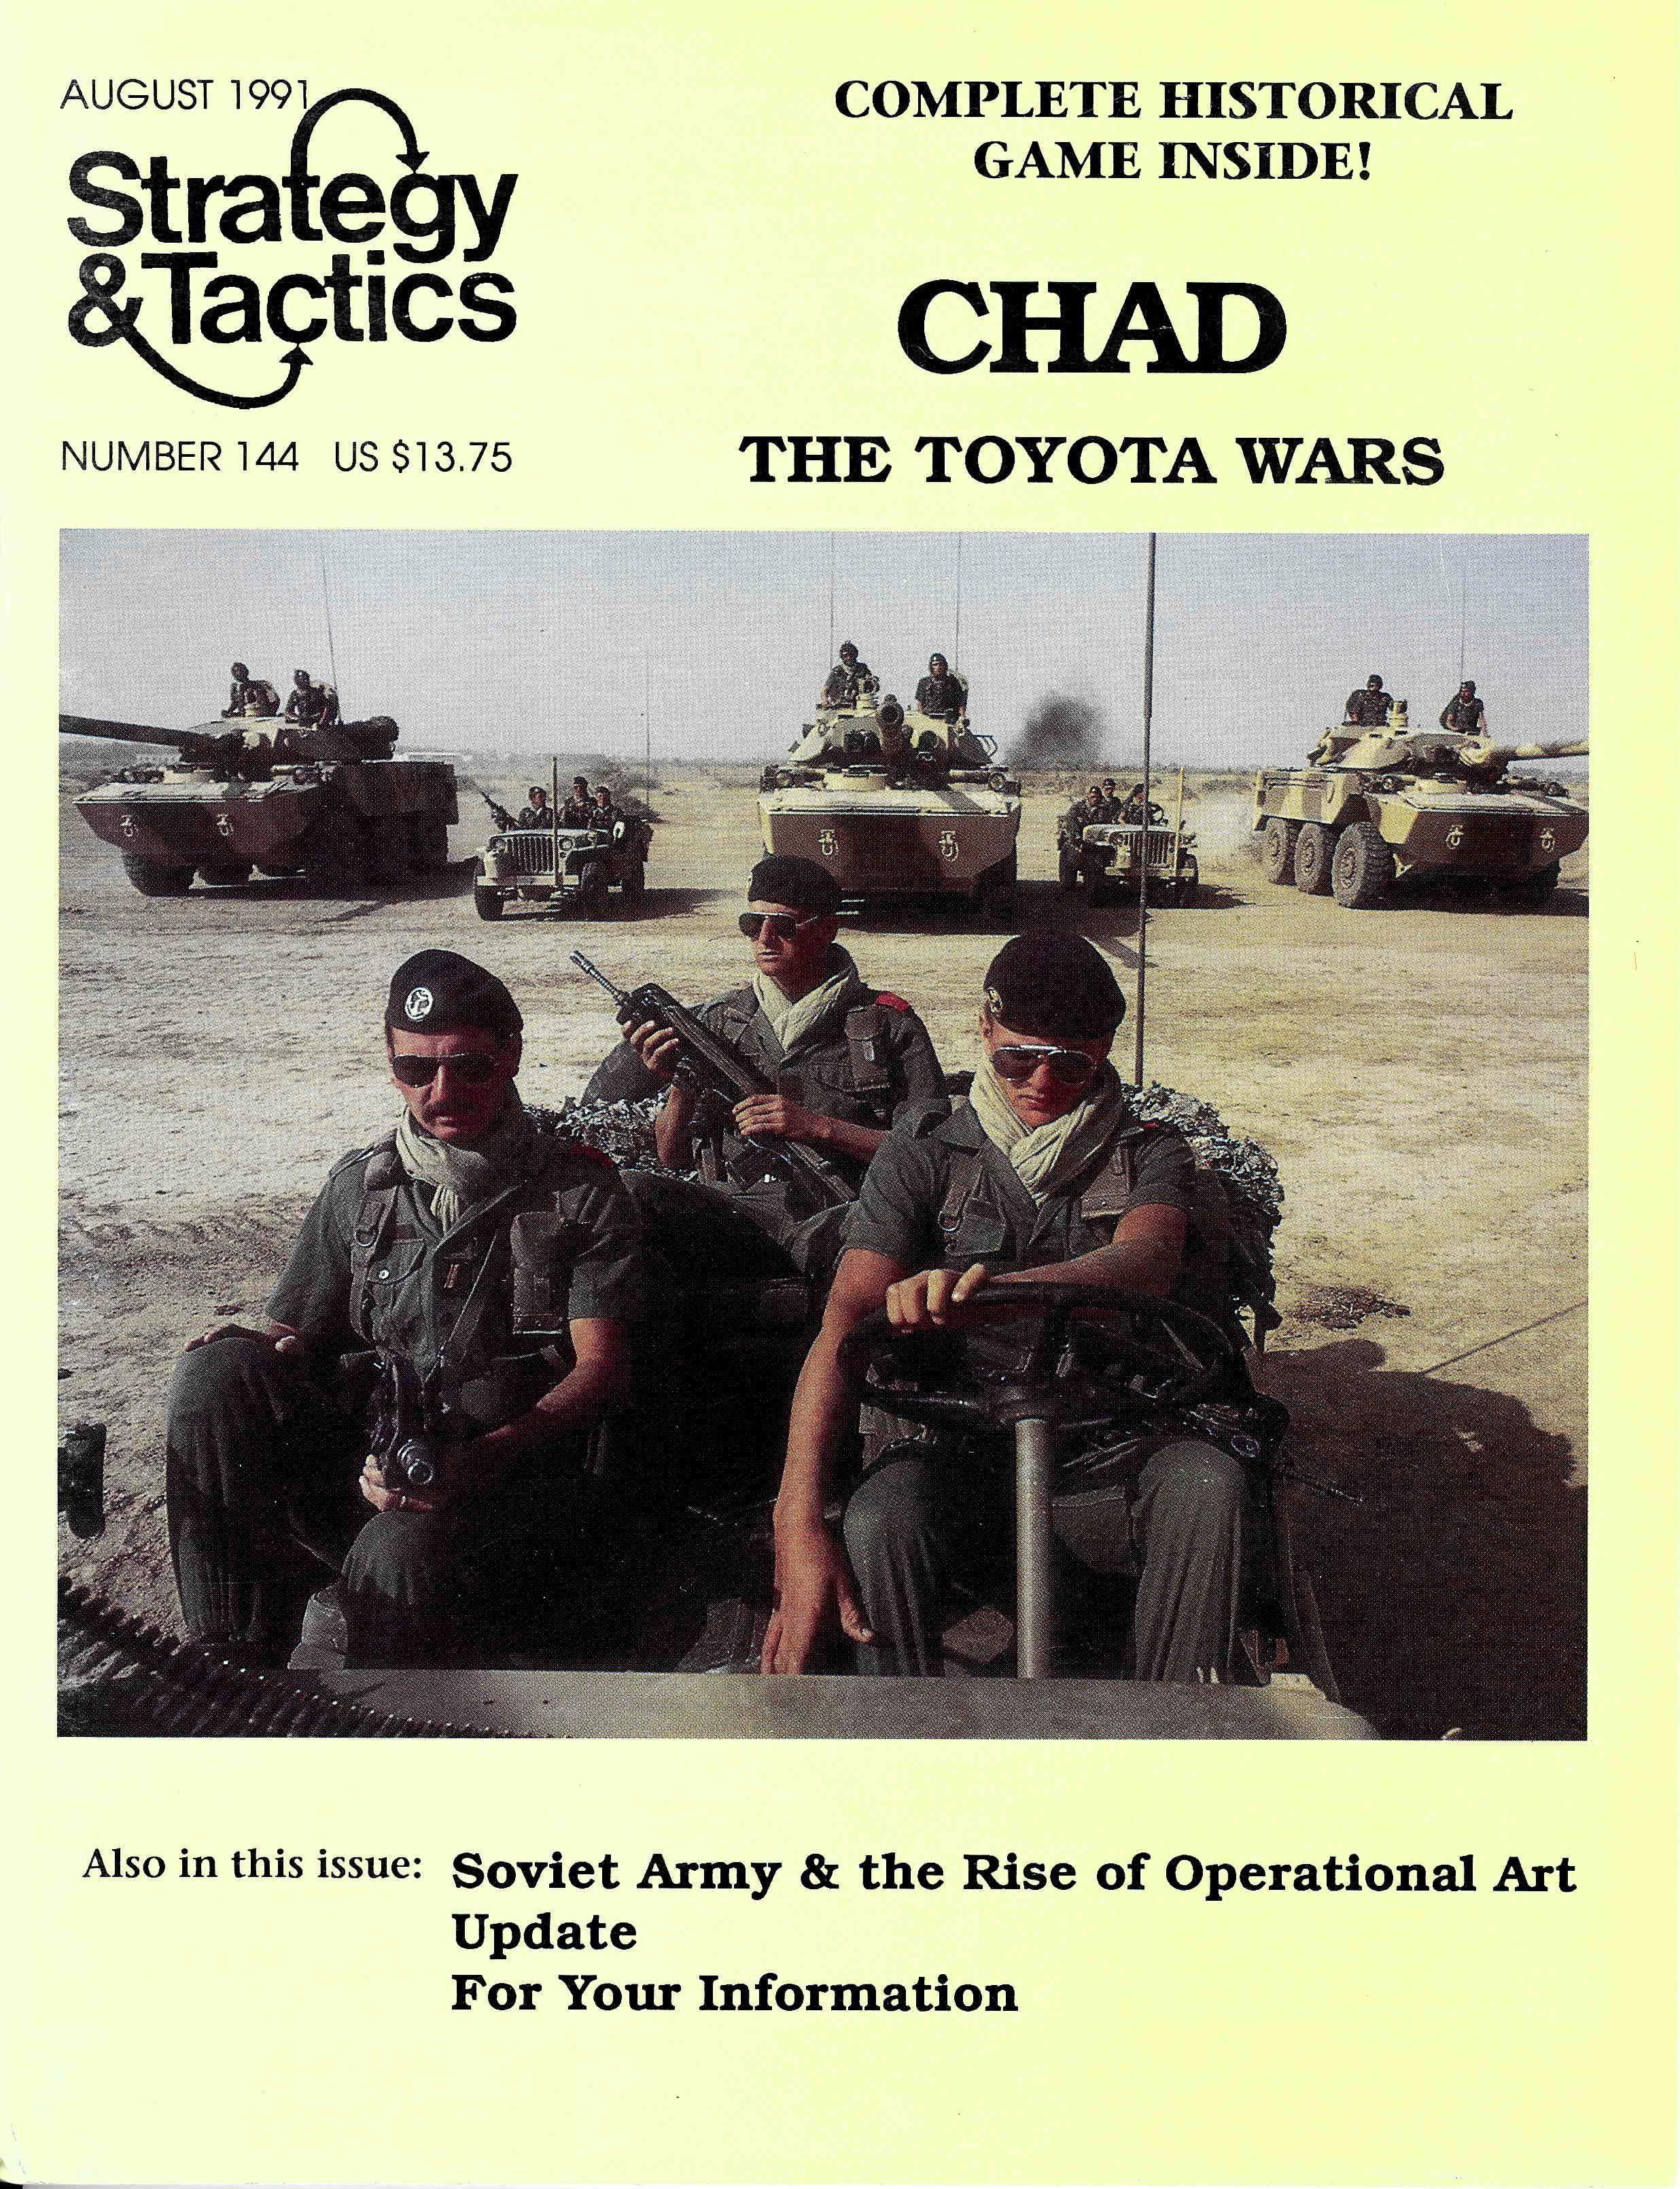 Chad: The Toyota Wars, 1979-1988